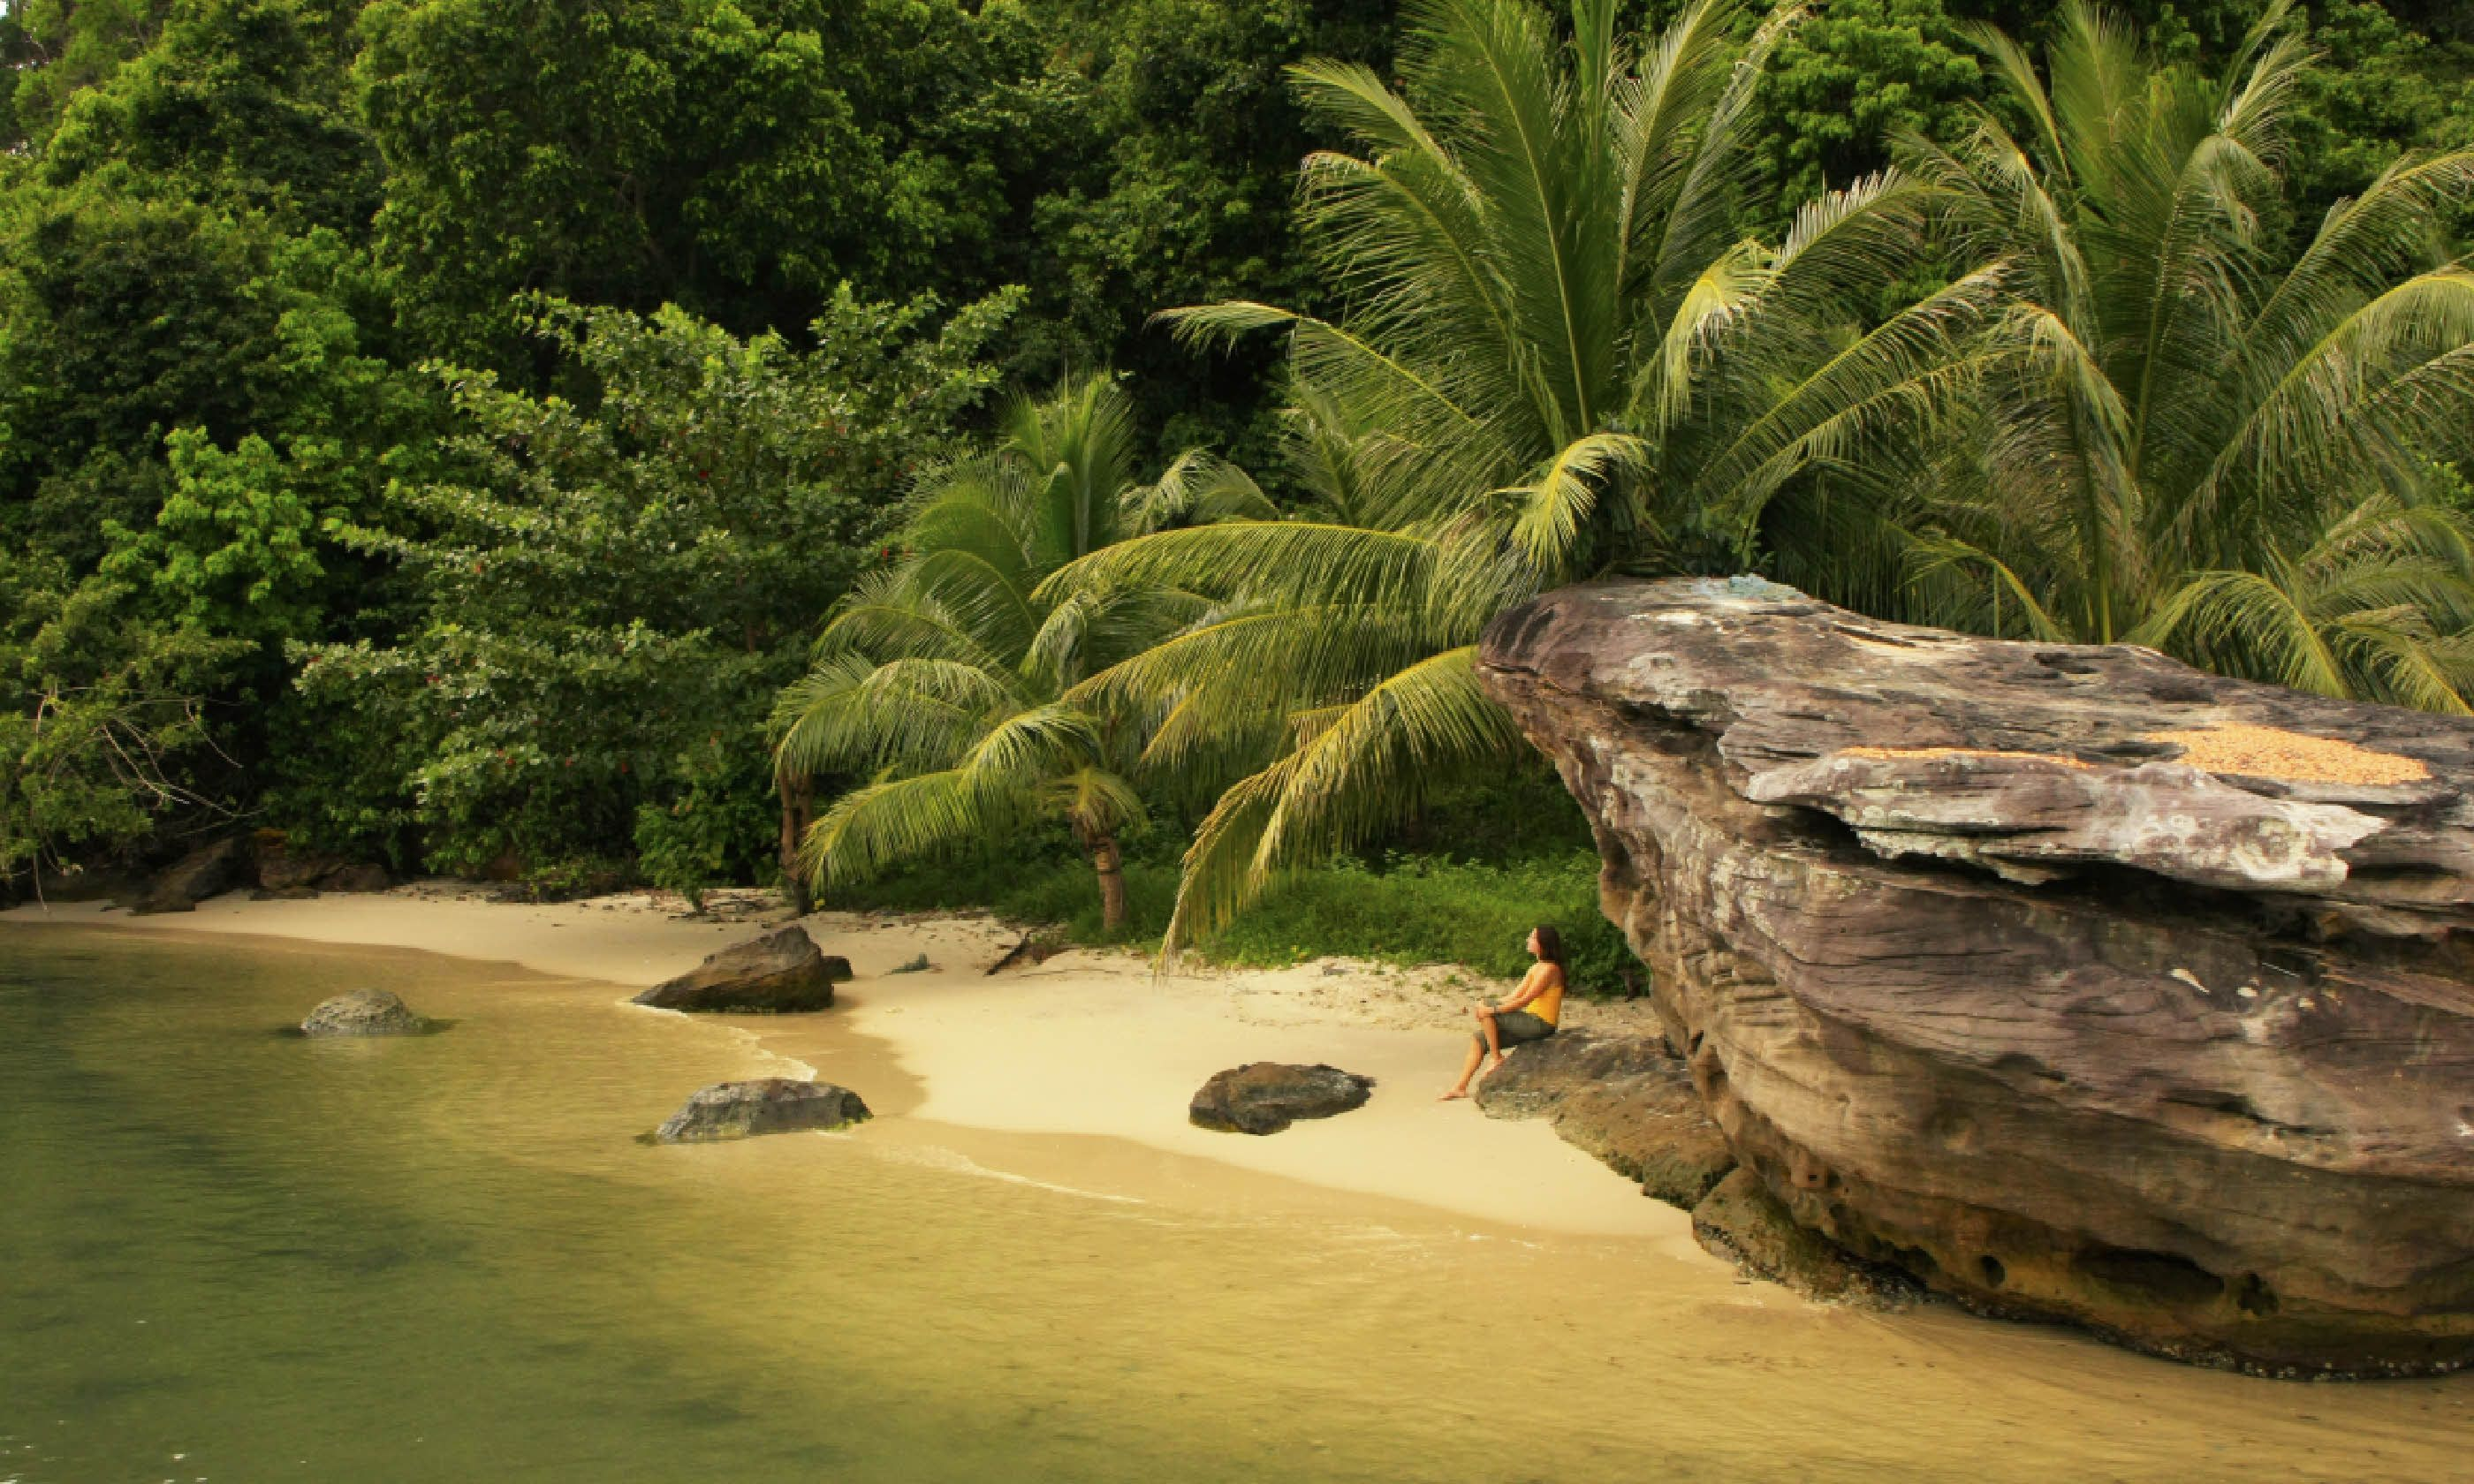 Small beach at Ream National Park, Cambodia (Shutterstock)